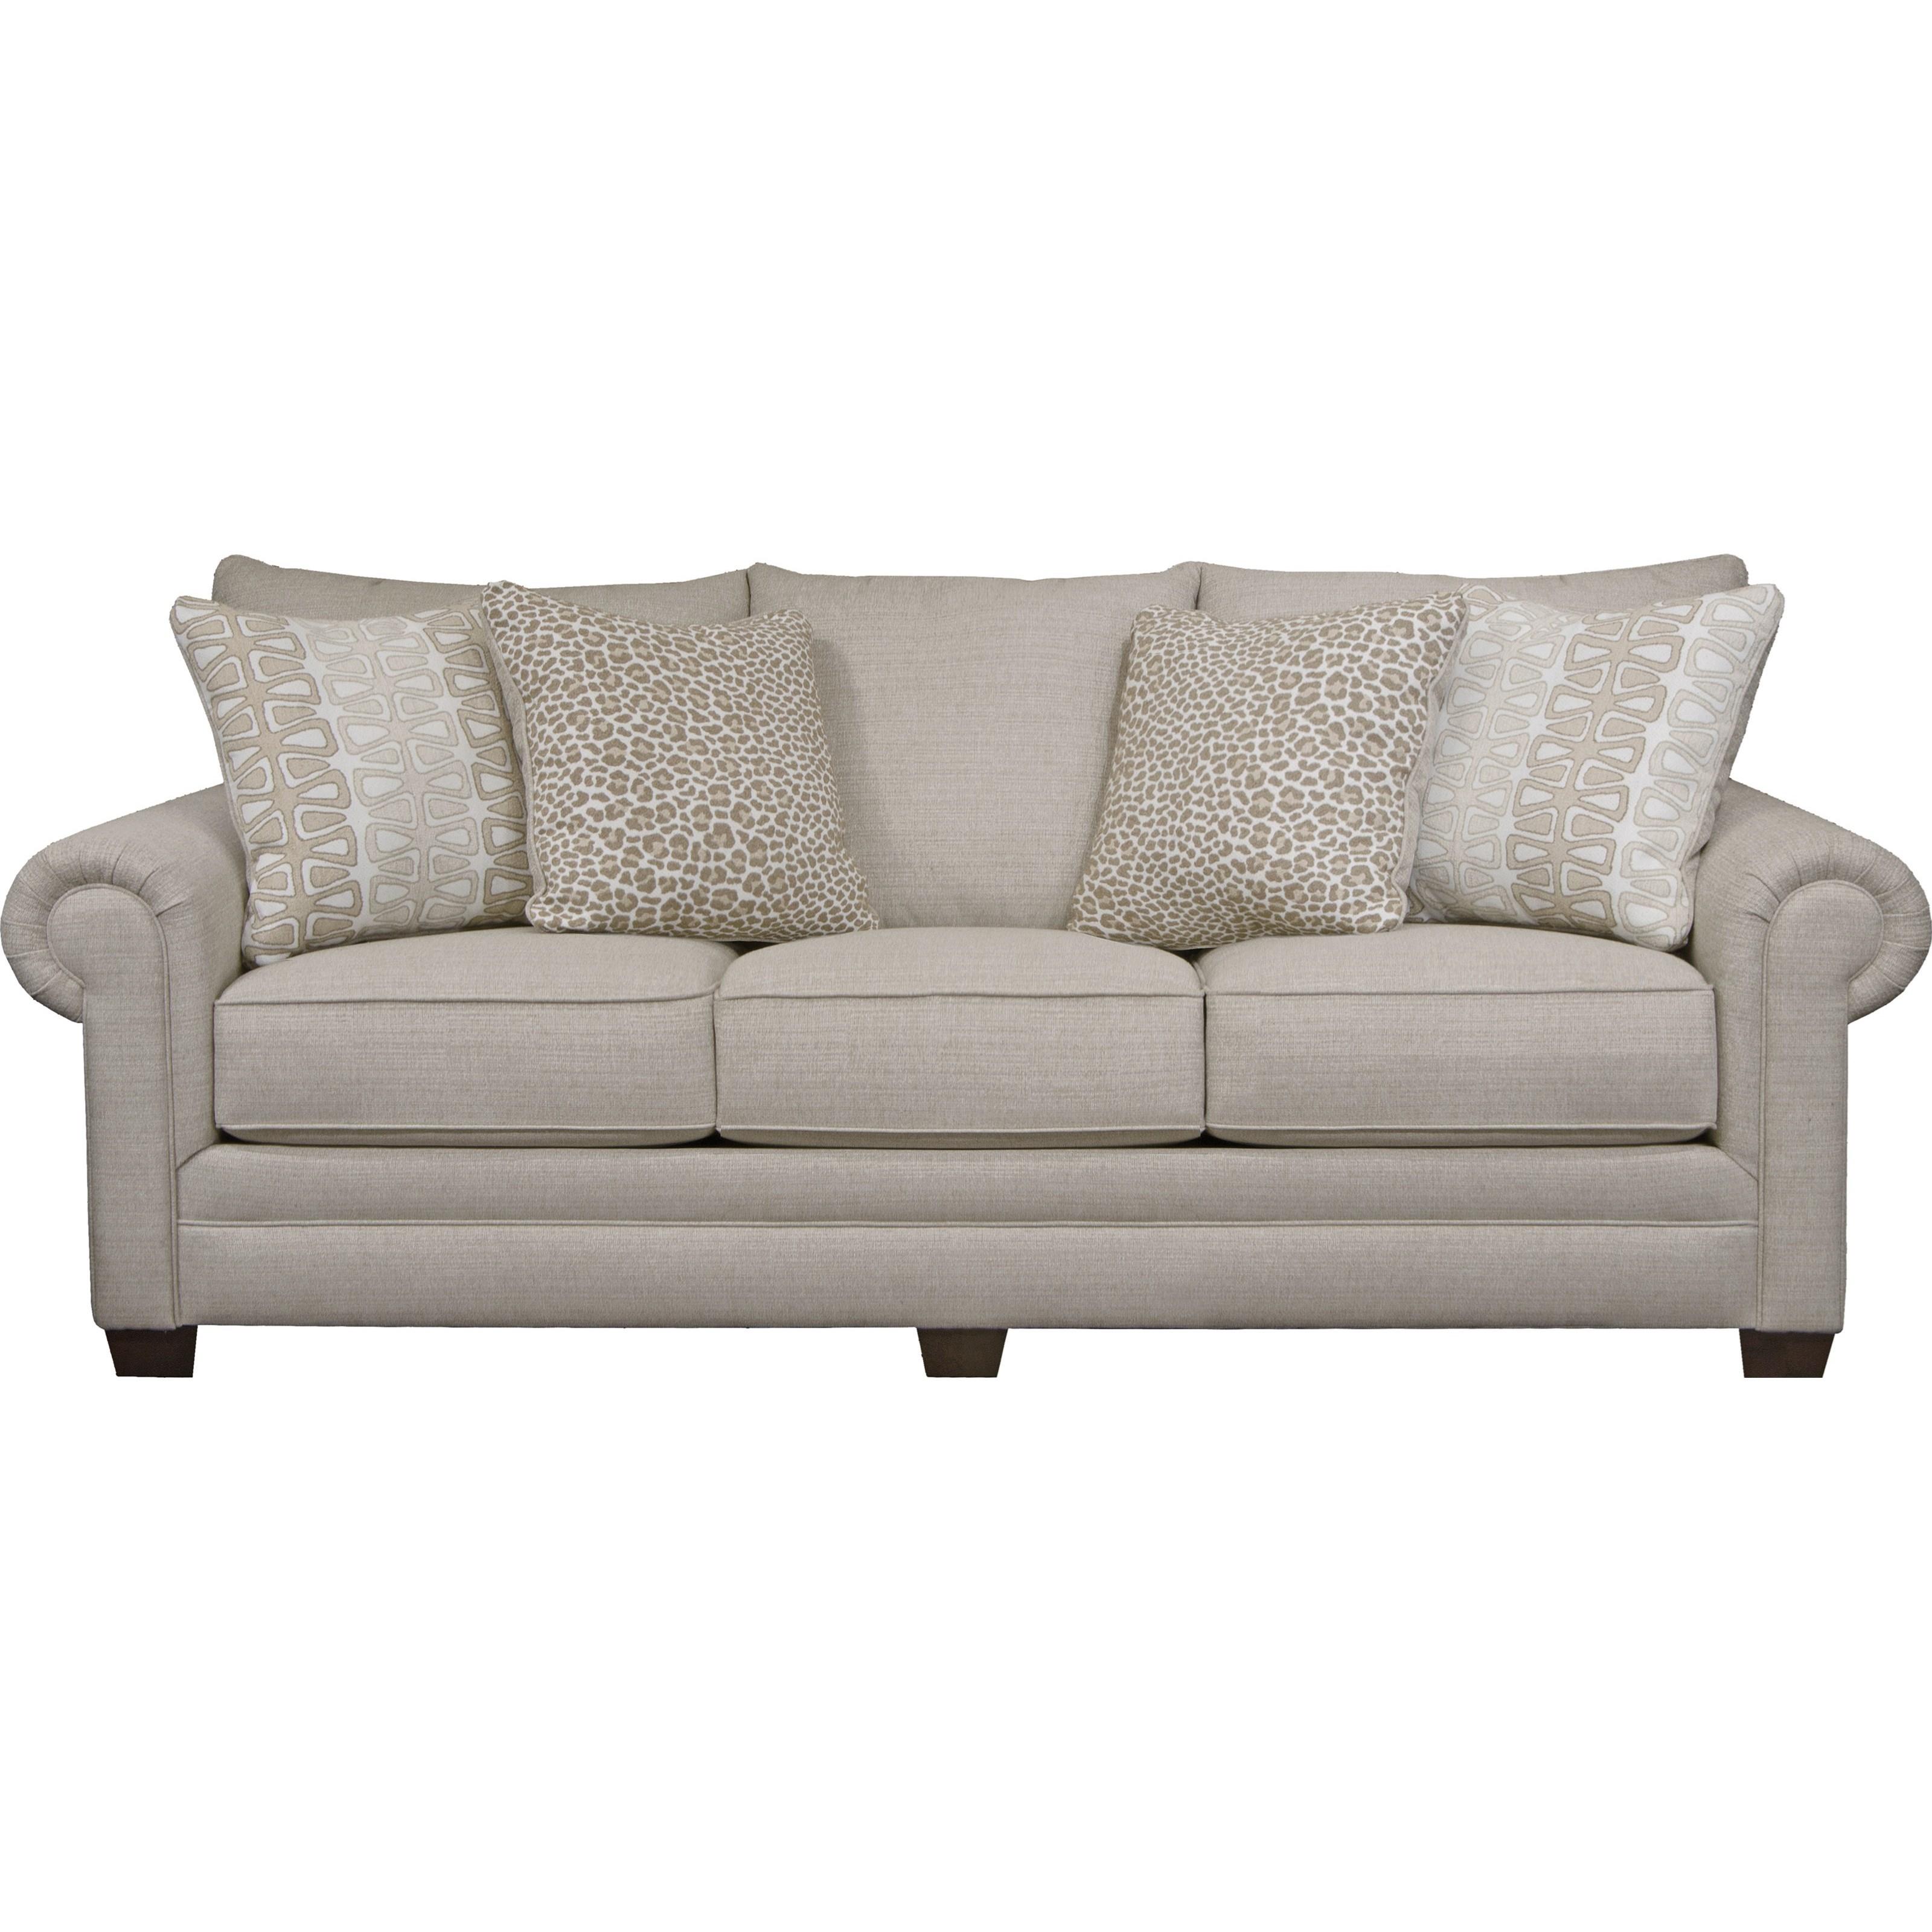 Havana Sofa by Jackson Furniture at Zak's Home